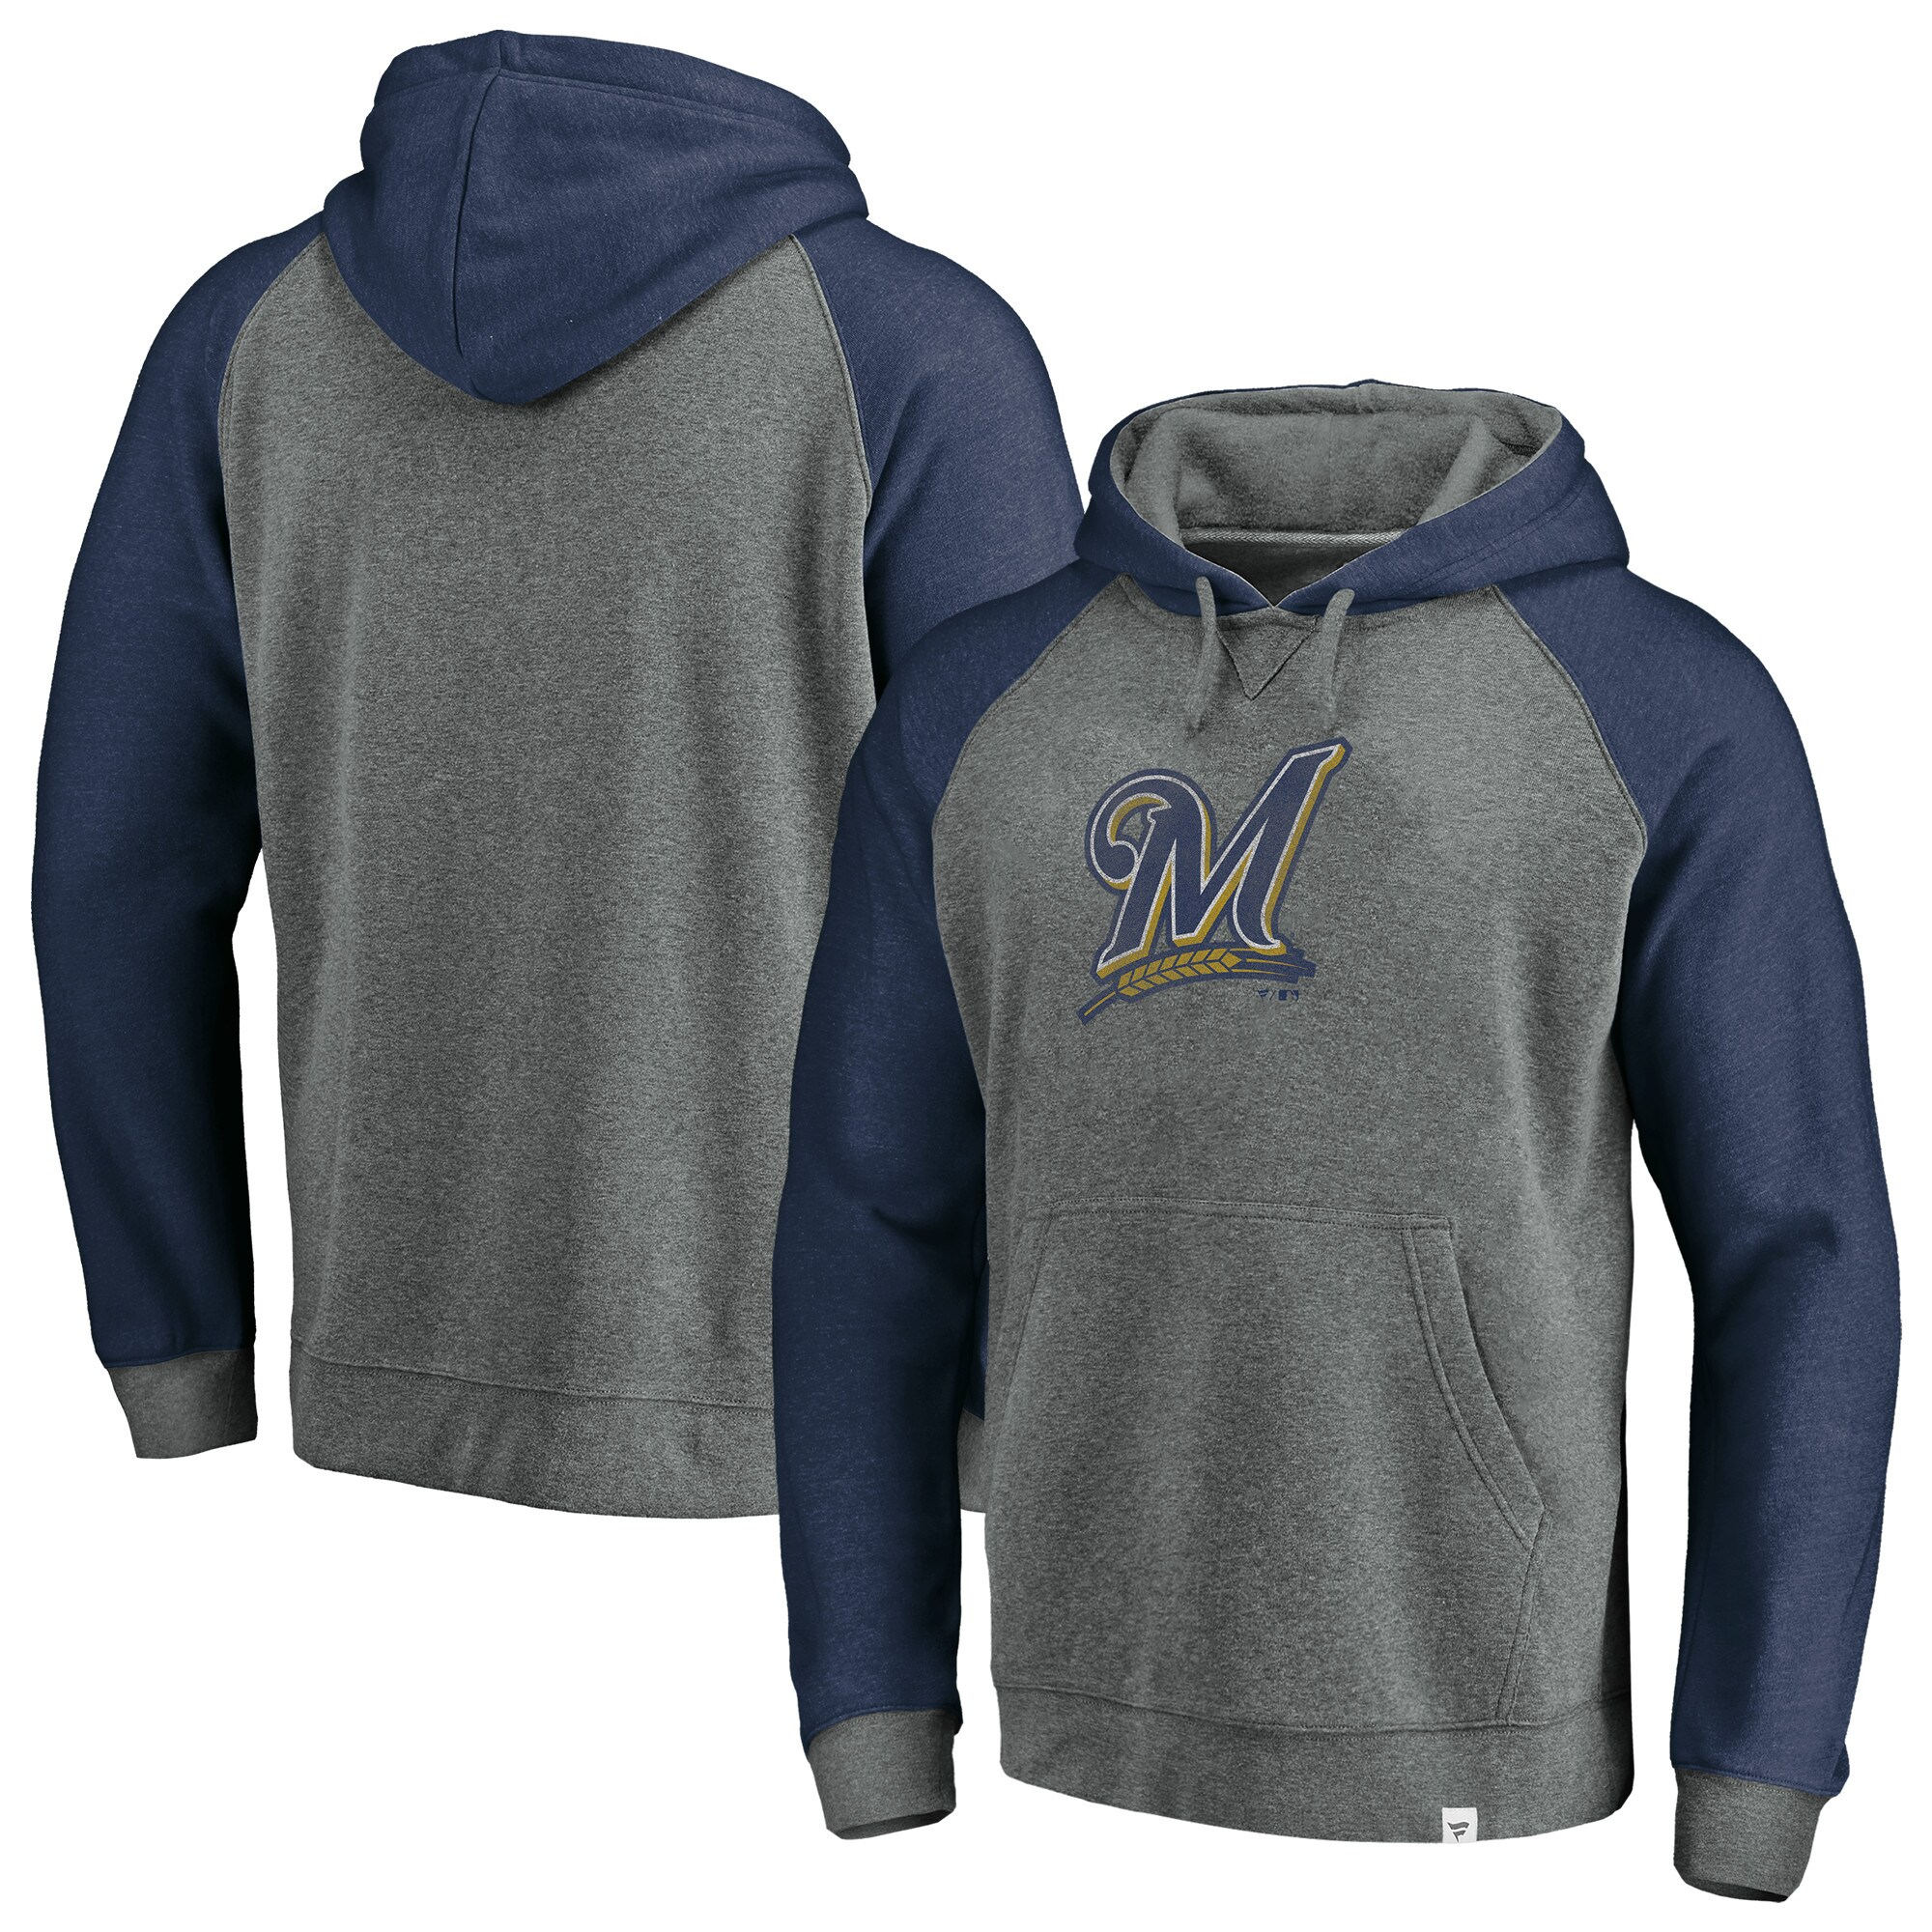 Milwaukee Brewers Fanatics Branded Team Logo Tri-Blend Pullover Hoodie - Gray/Navy